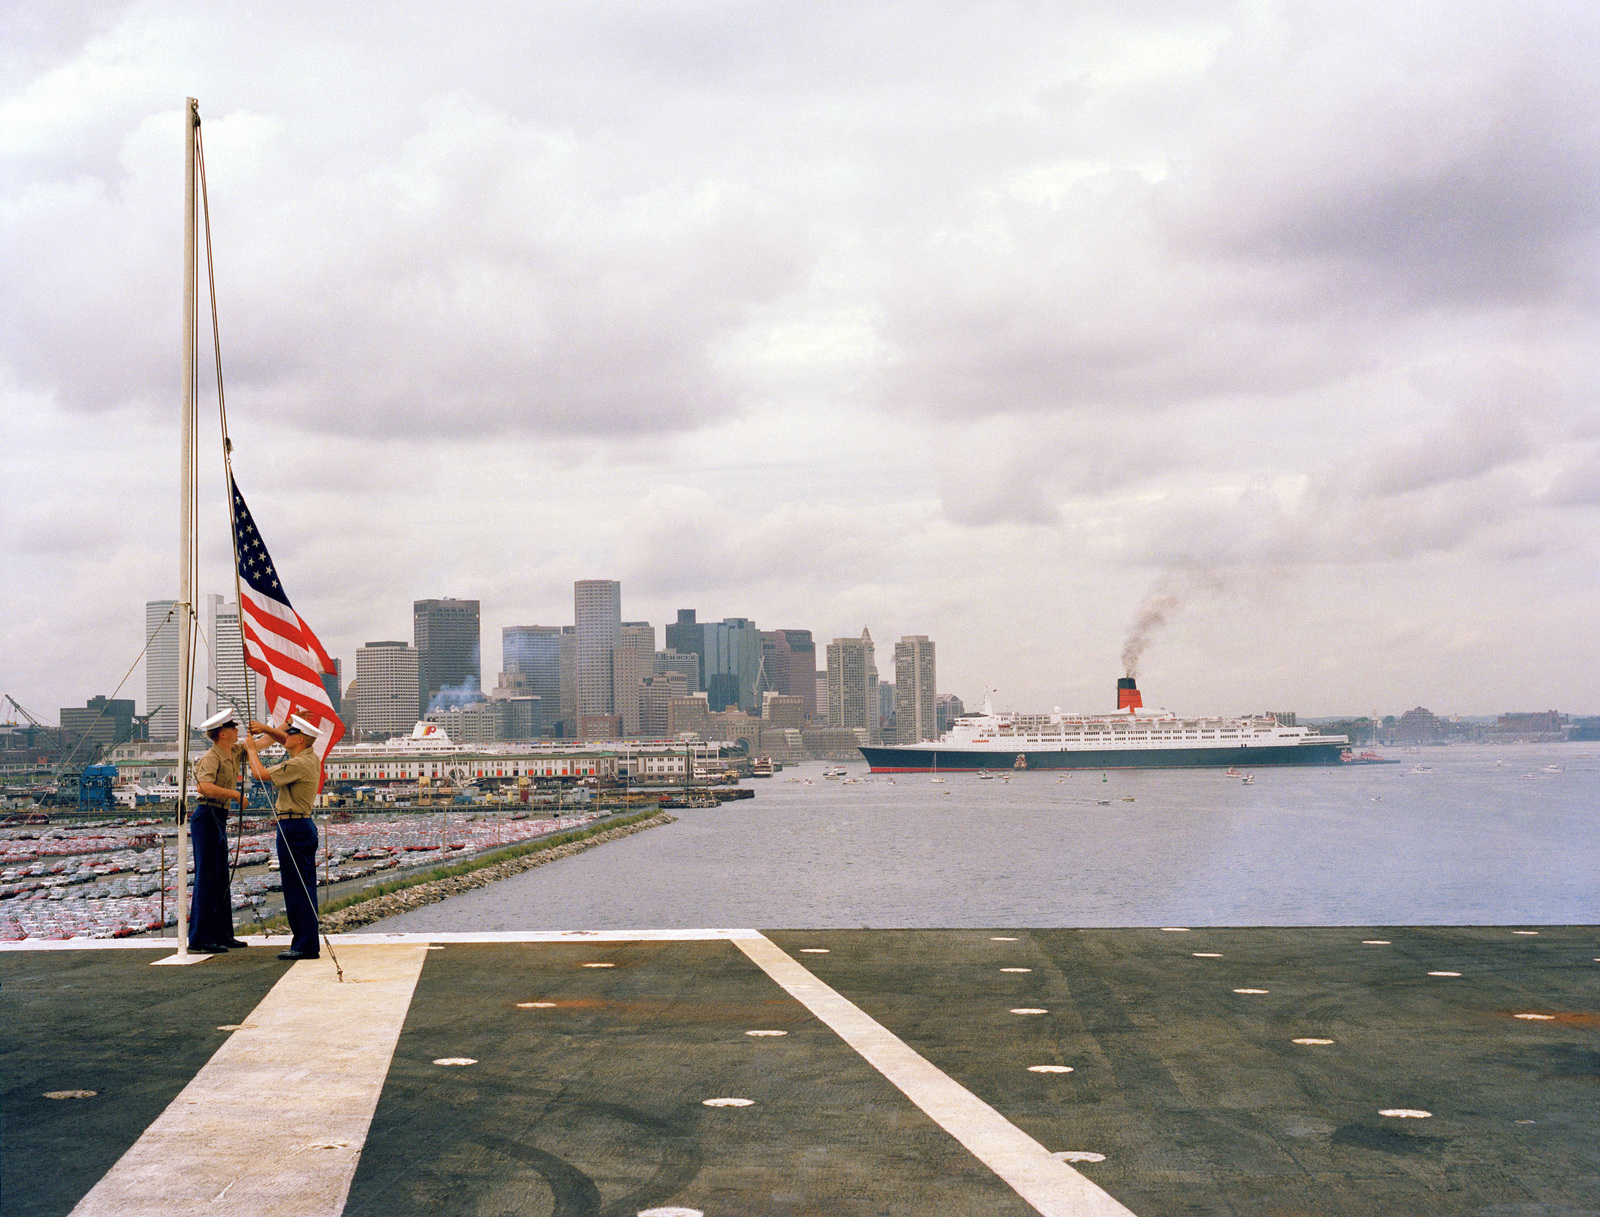 marines on board the aircraft carrier uss john f kennedy cv 67